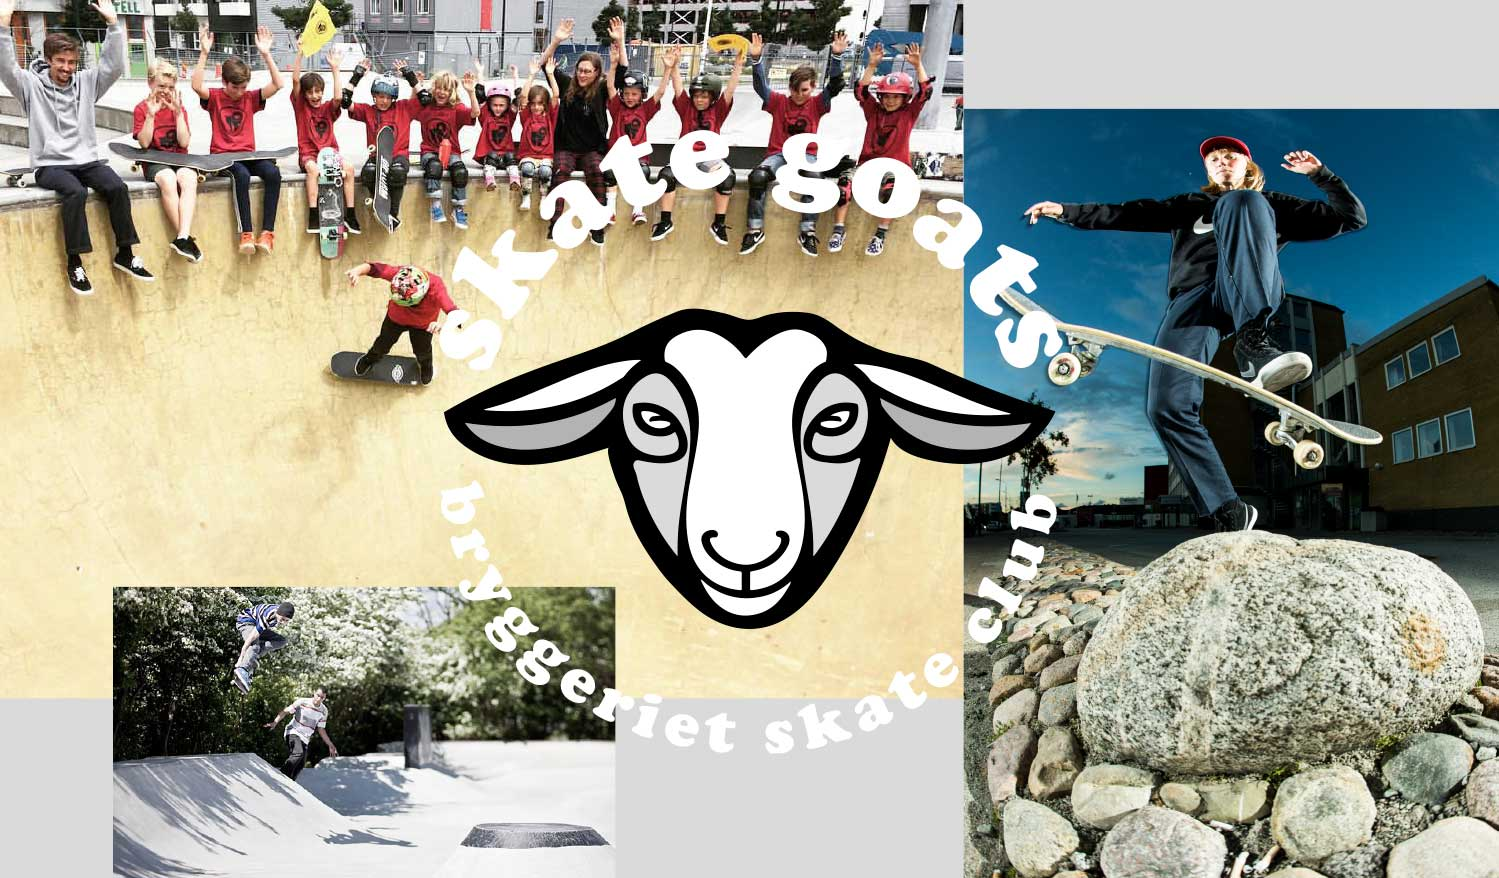 Skate-Goats-2018_pdf-3